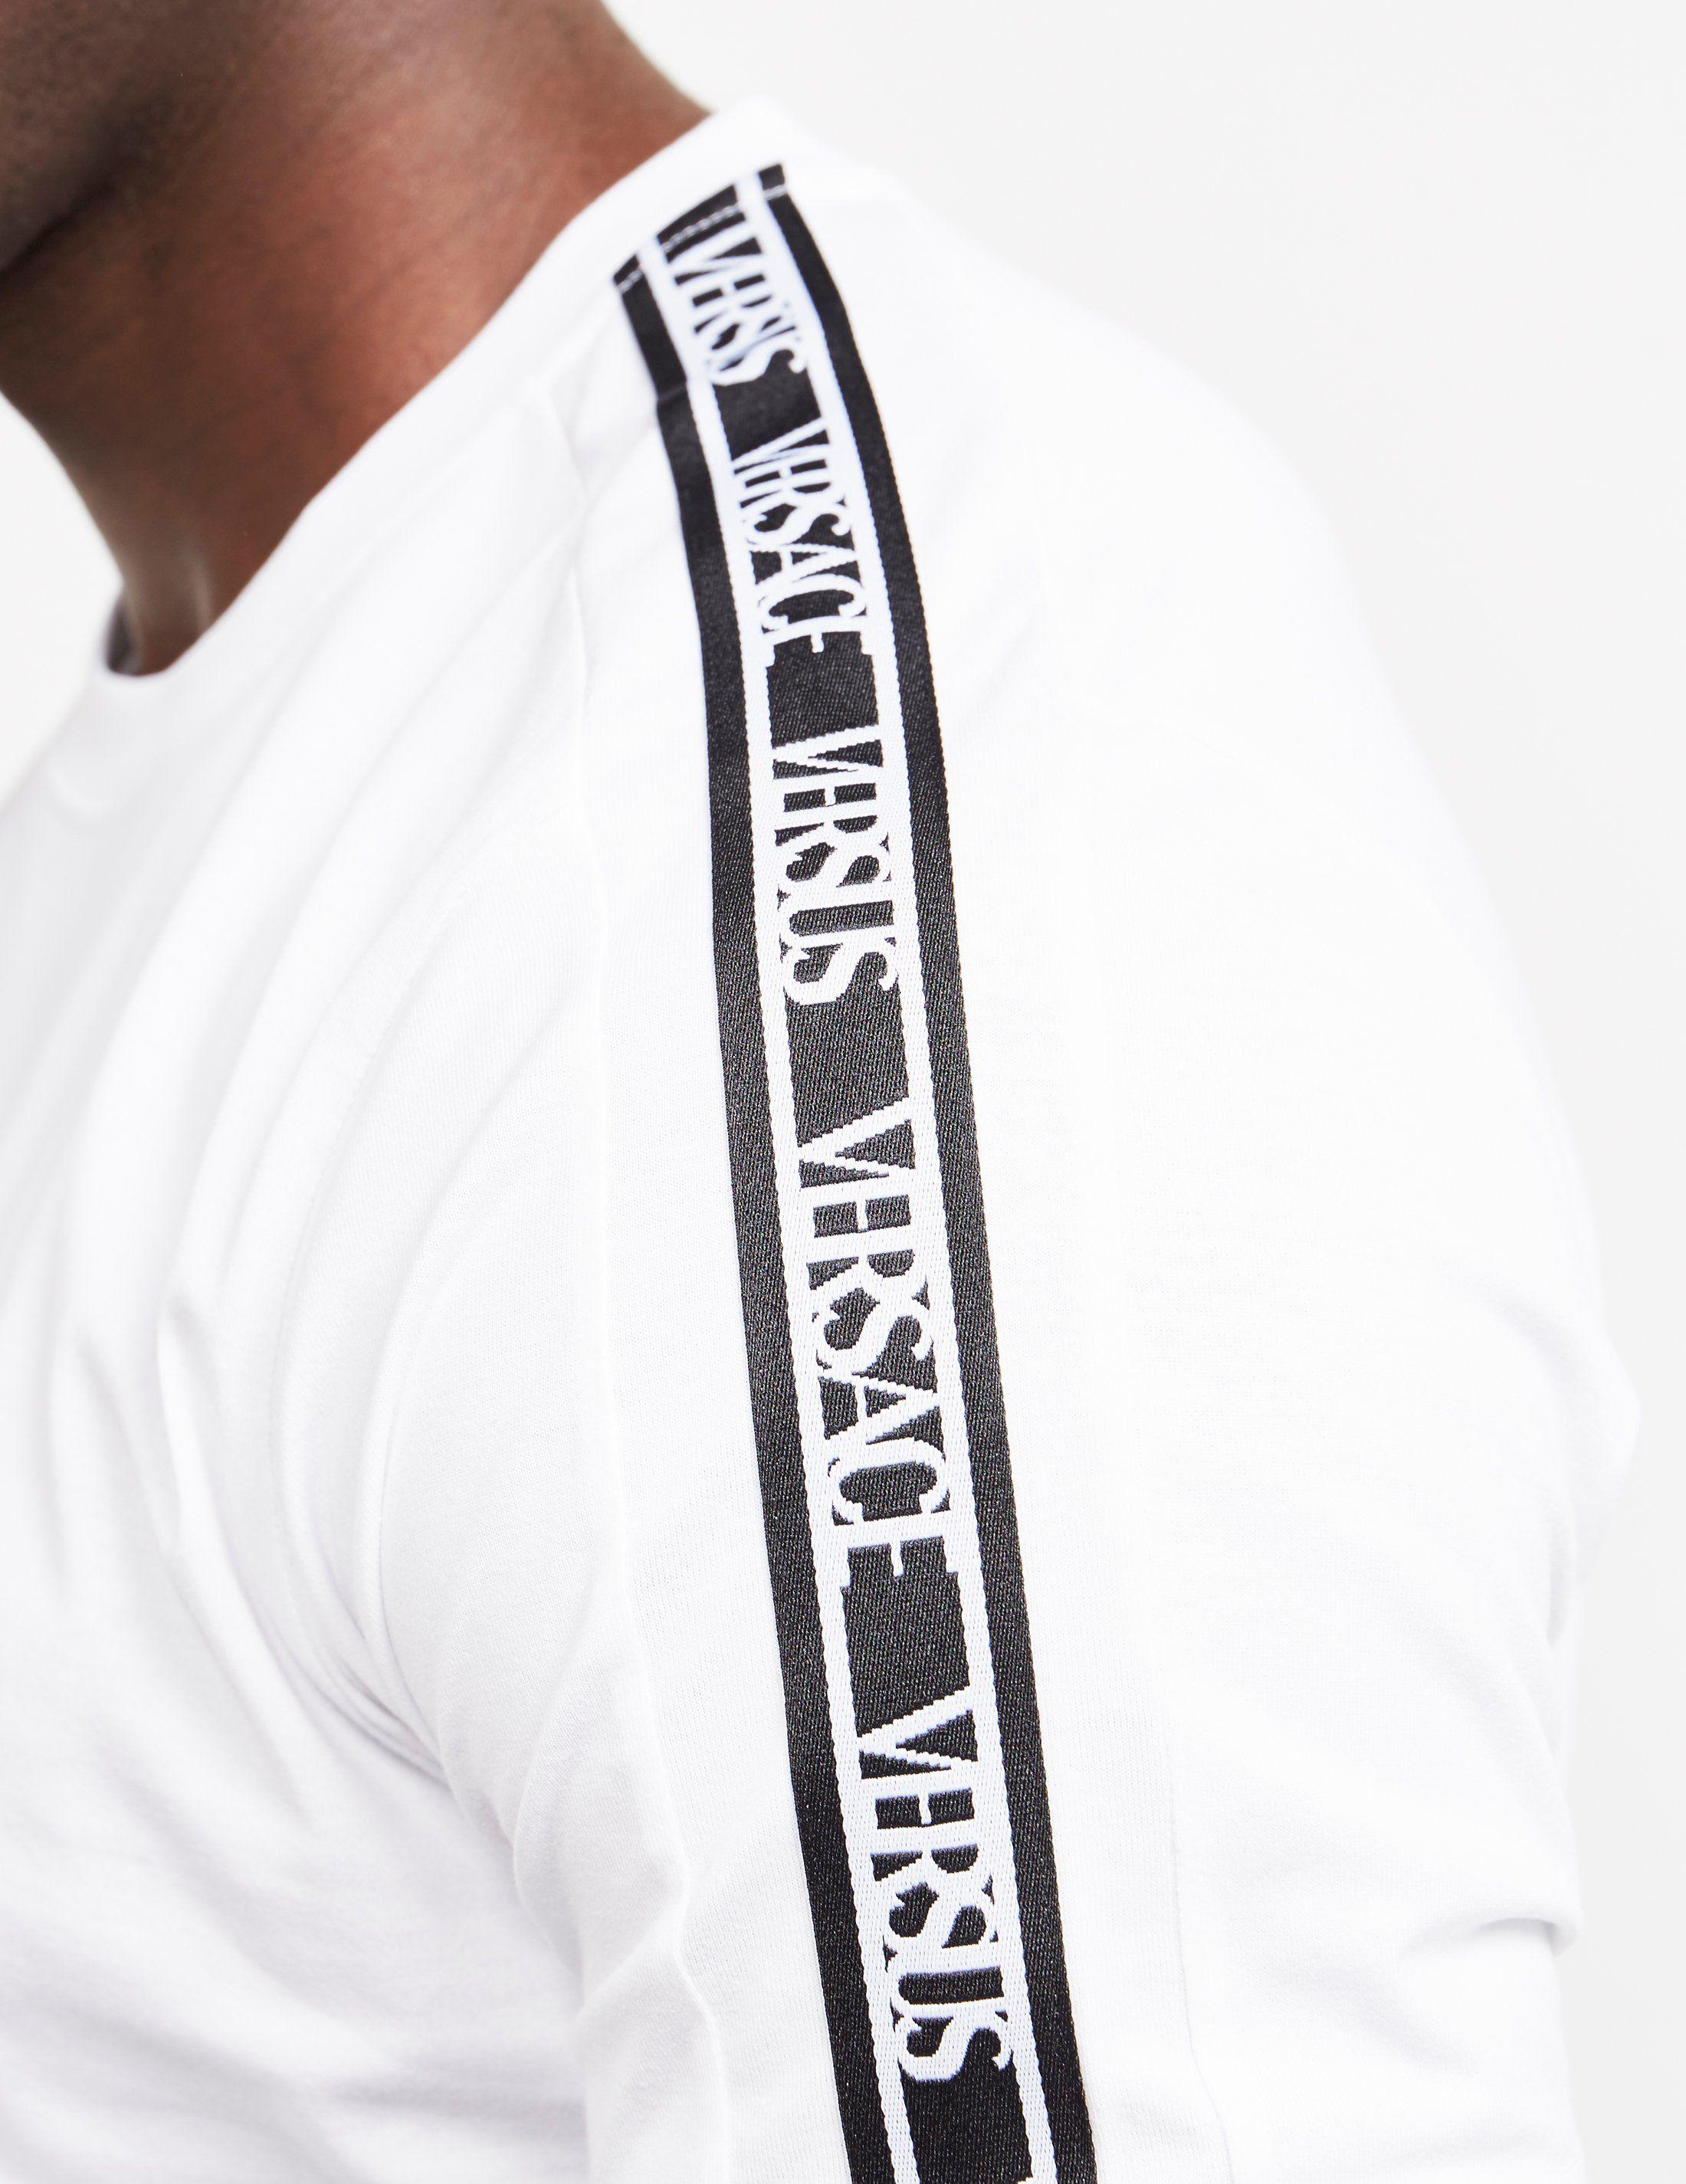 Versus Versace Tape Short Sleeve T-Shirt